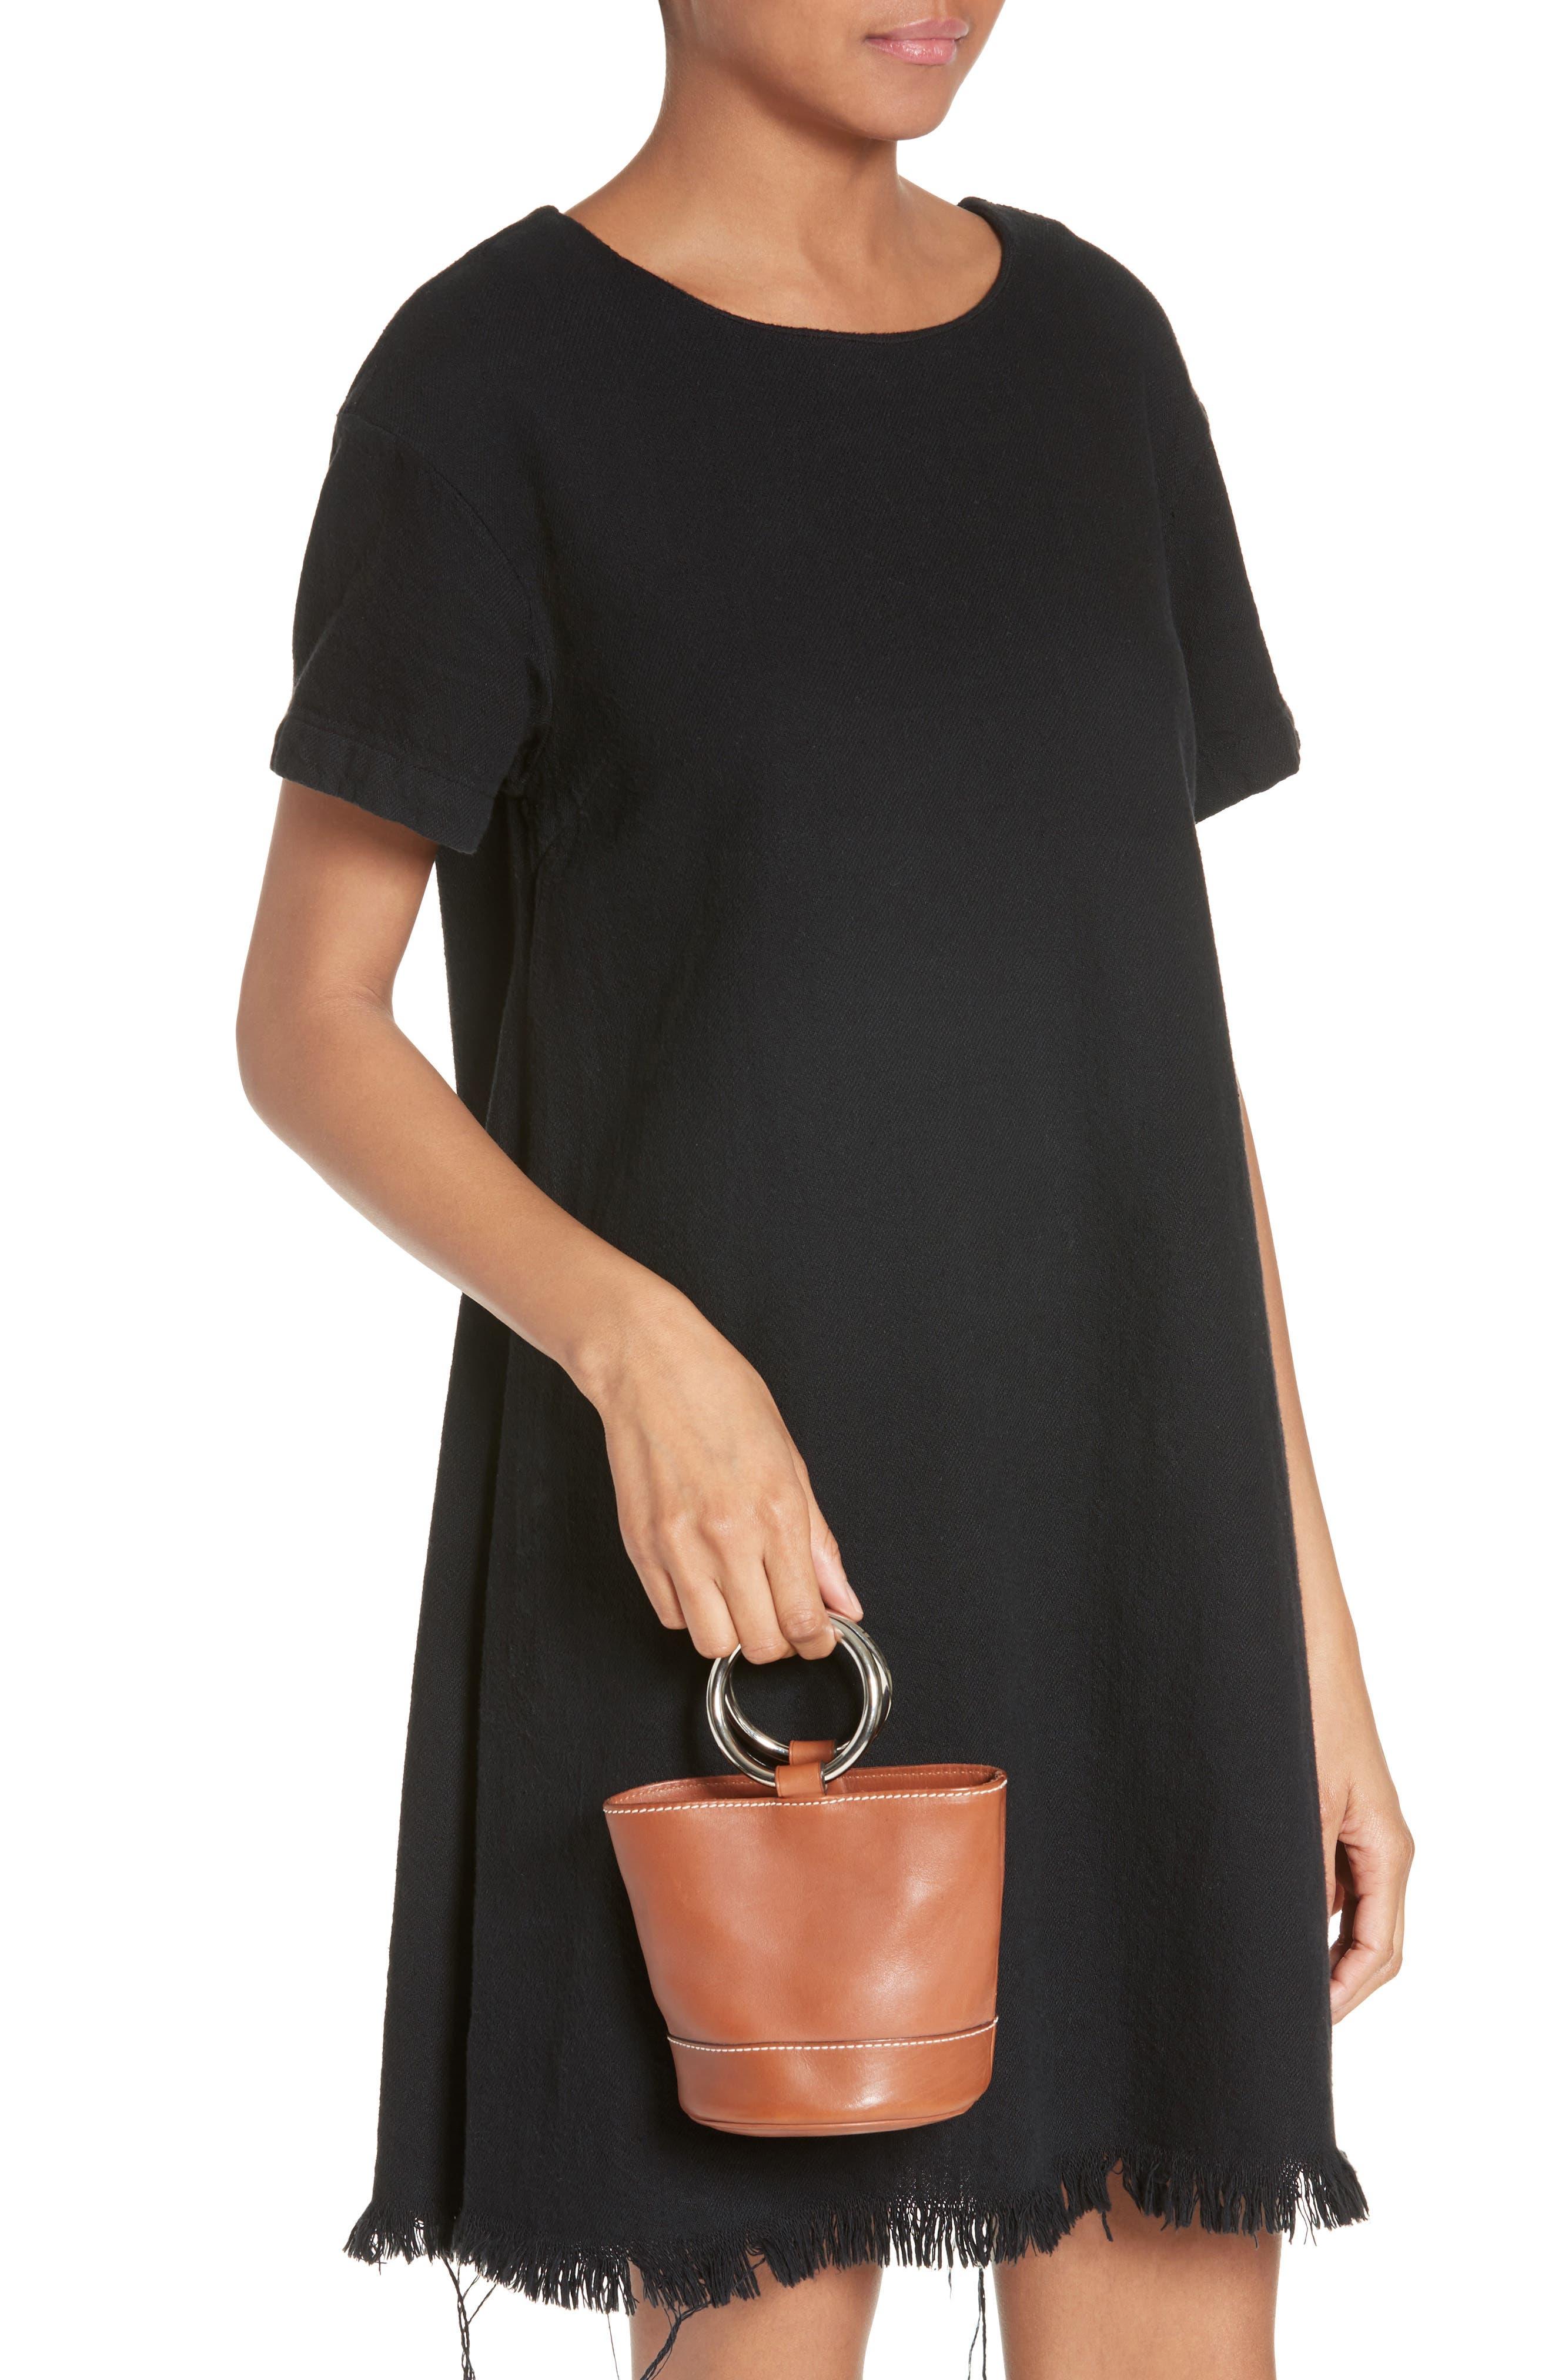 Bonsai Pebbled Leather Bucket Bag,                             Alternate thumbnail 2, color,                             Tan